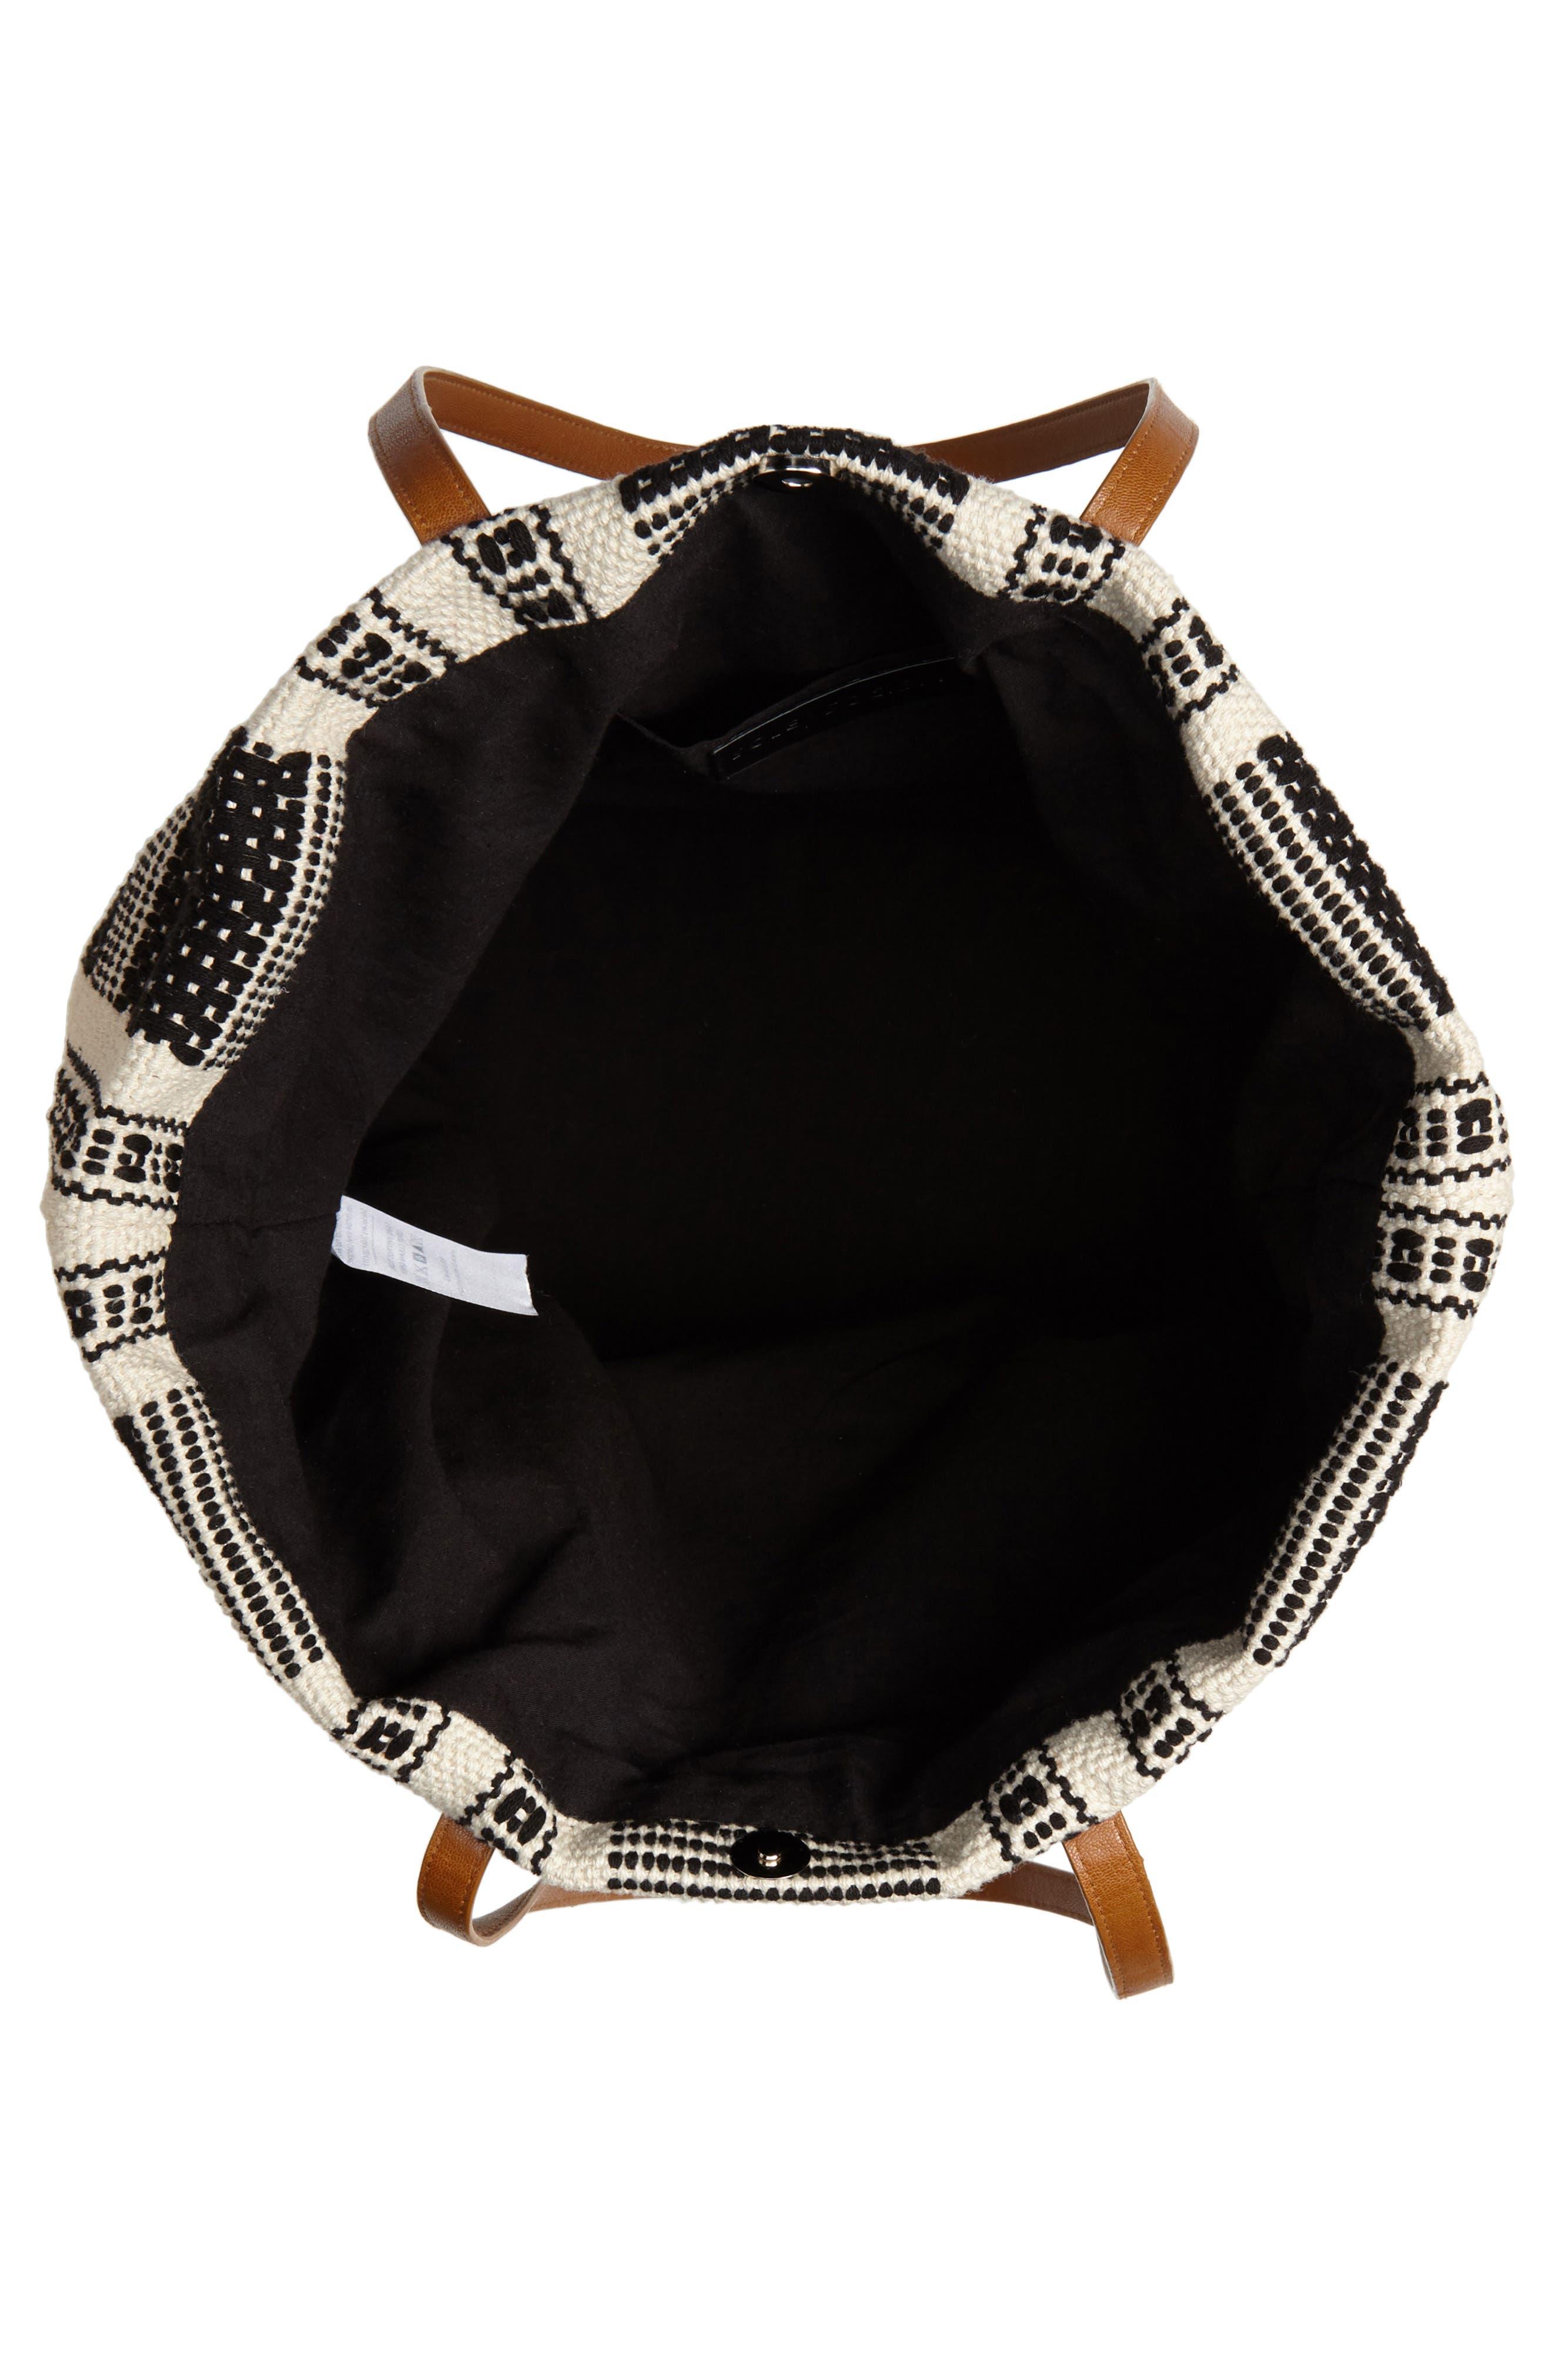 Oversized Fabric Tote,                             Alternate thumbnail 4, color,                             Black/ White